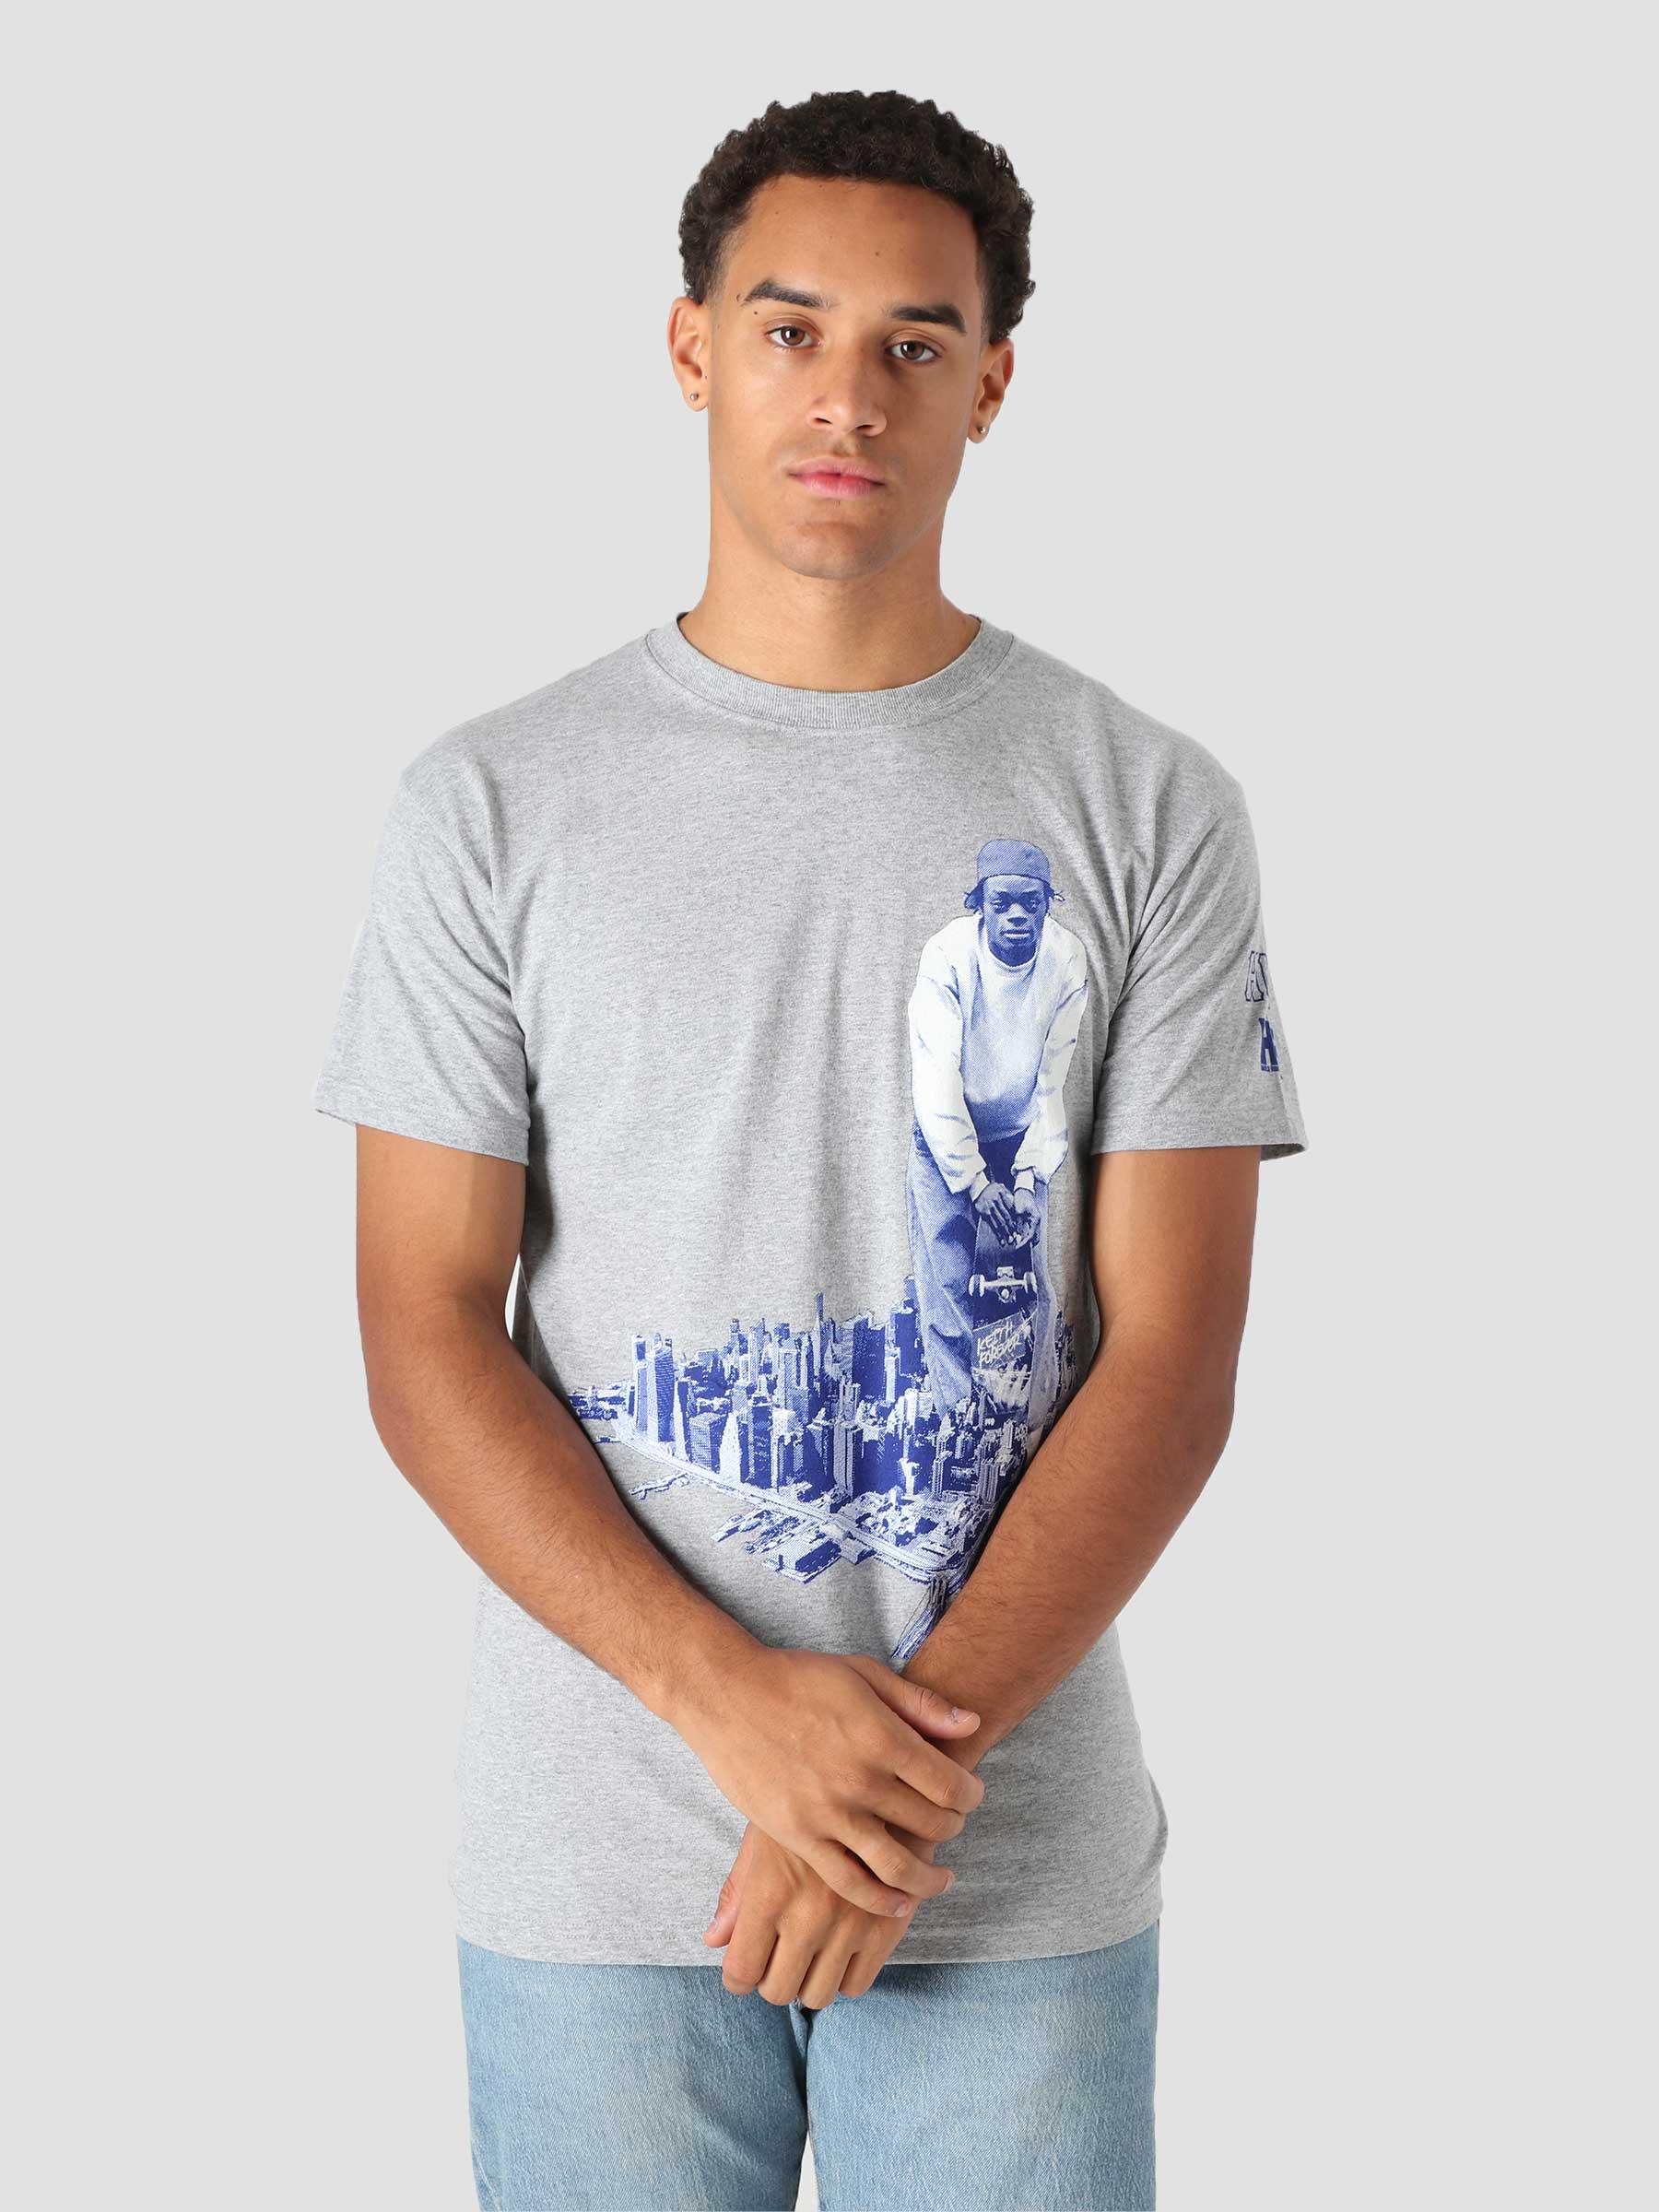 x Harold Hunter T-Shirt Grey TS01771-GYHTR